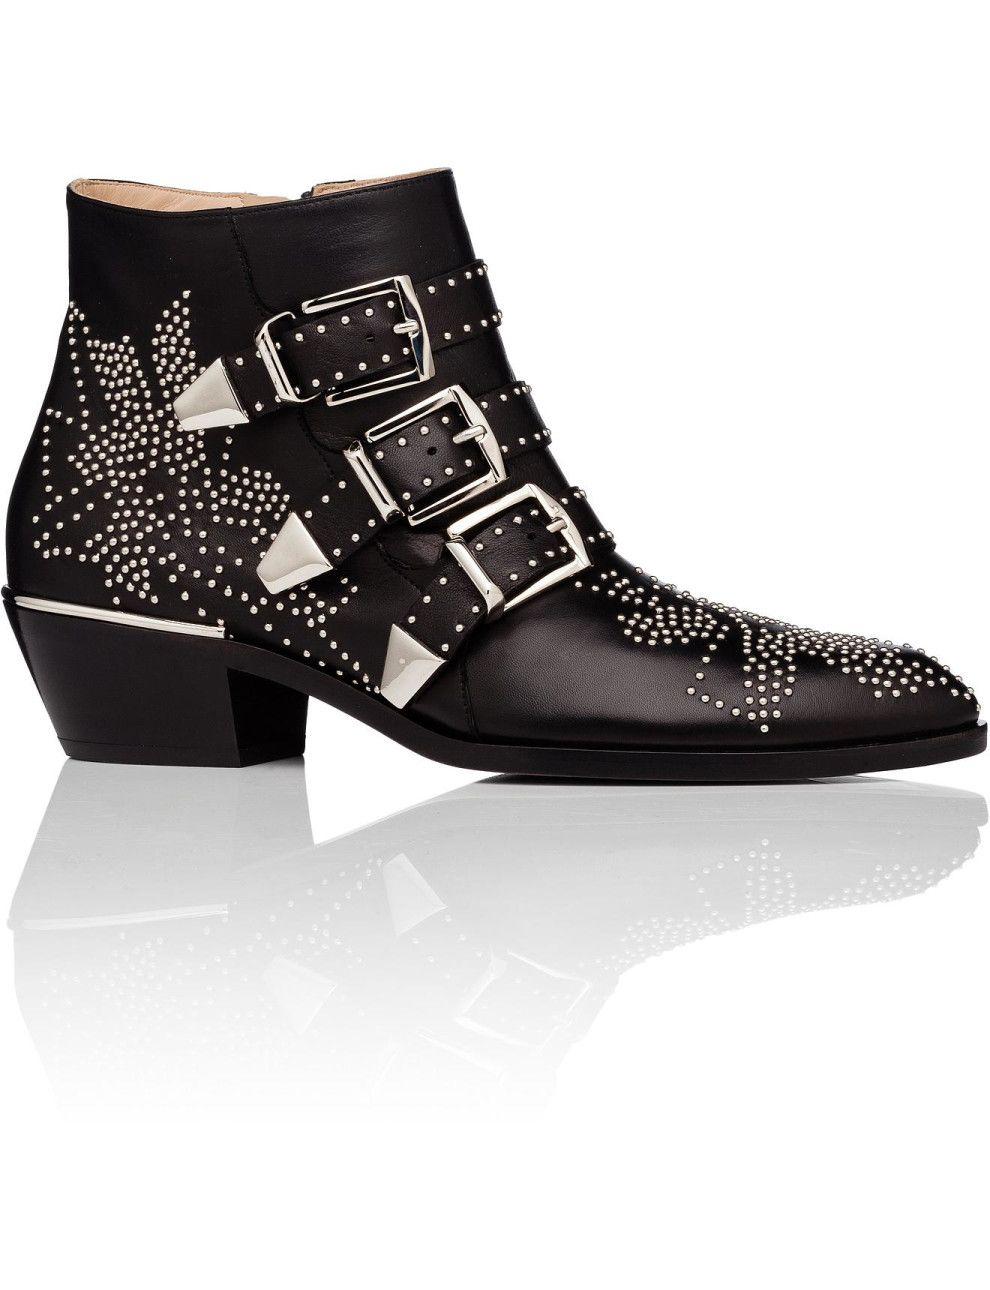 97a489848c25 Susanna Boot W  Silver Studs